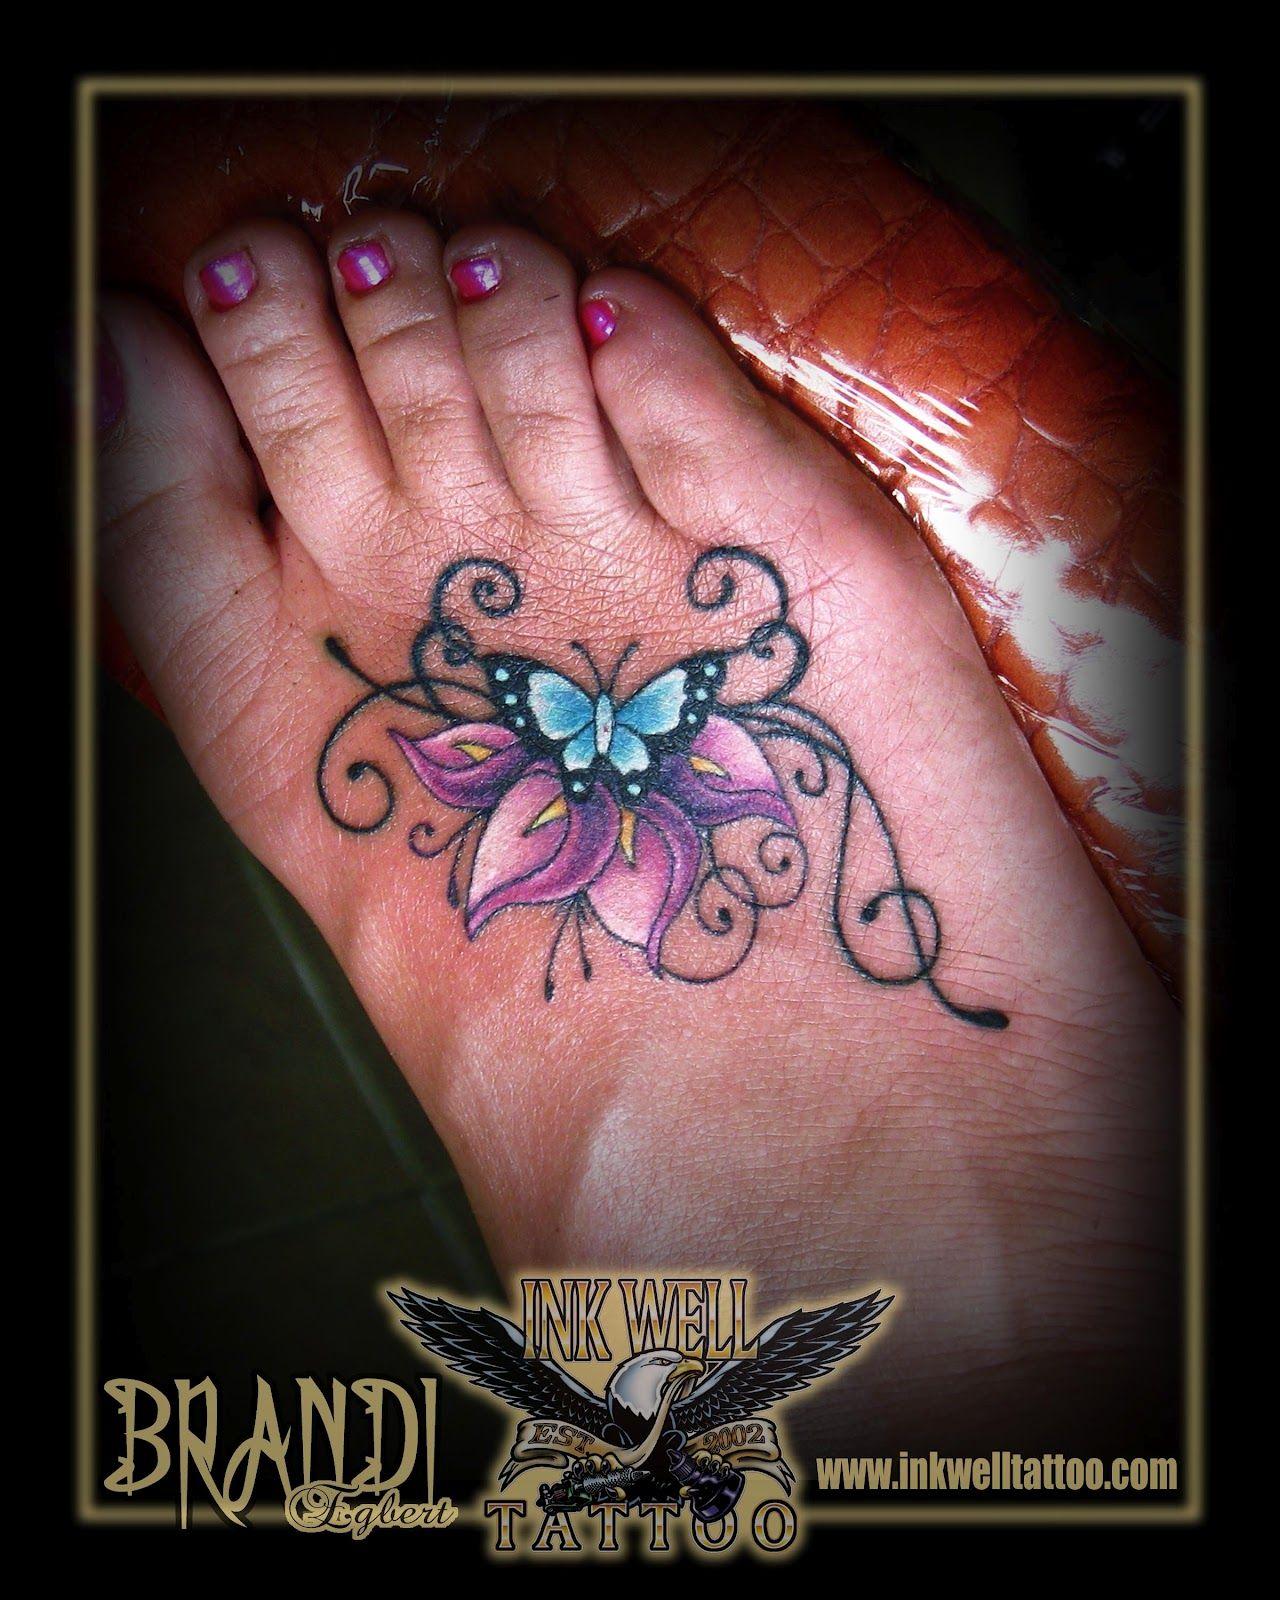 Brandi egbert ink well tattoo butterfly and calla liliy